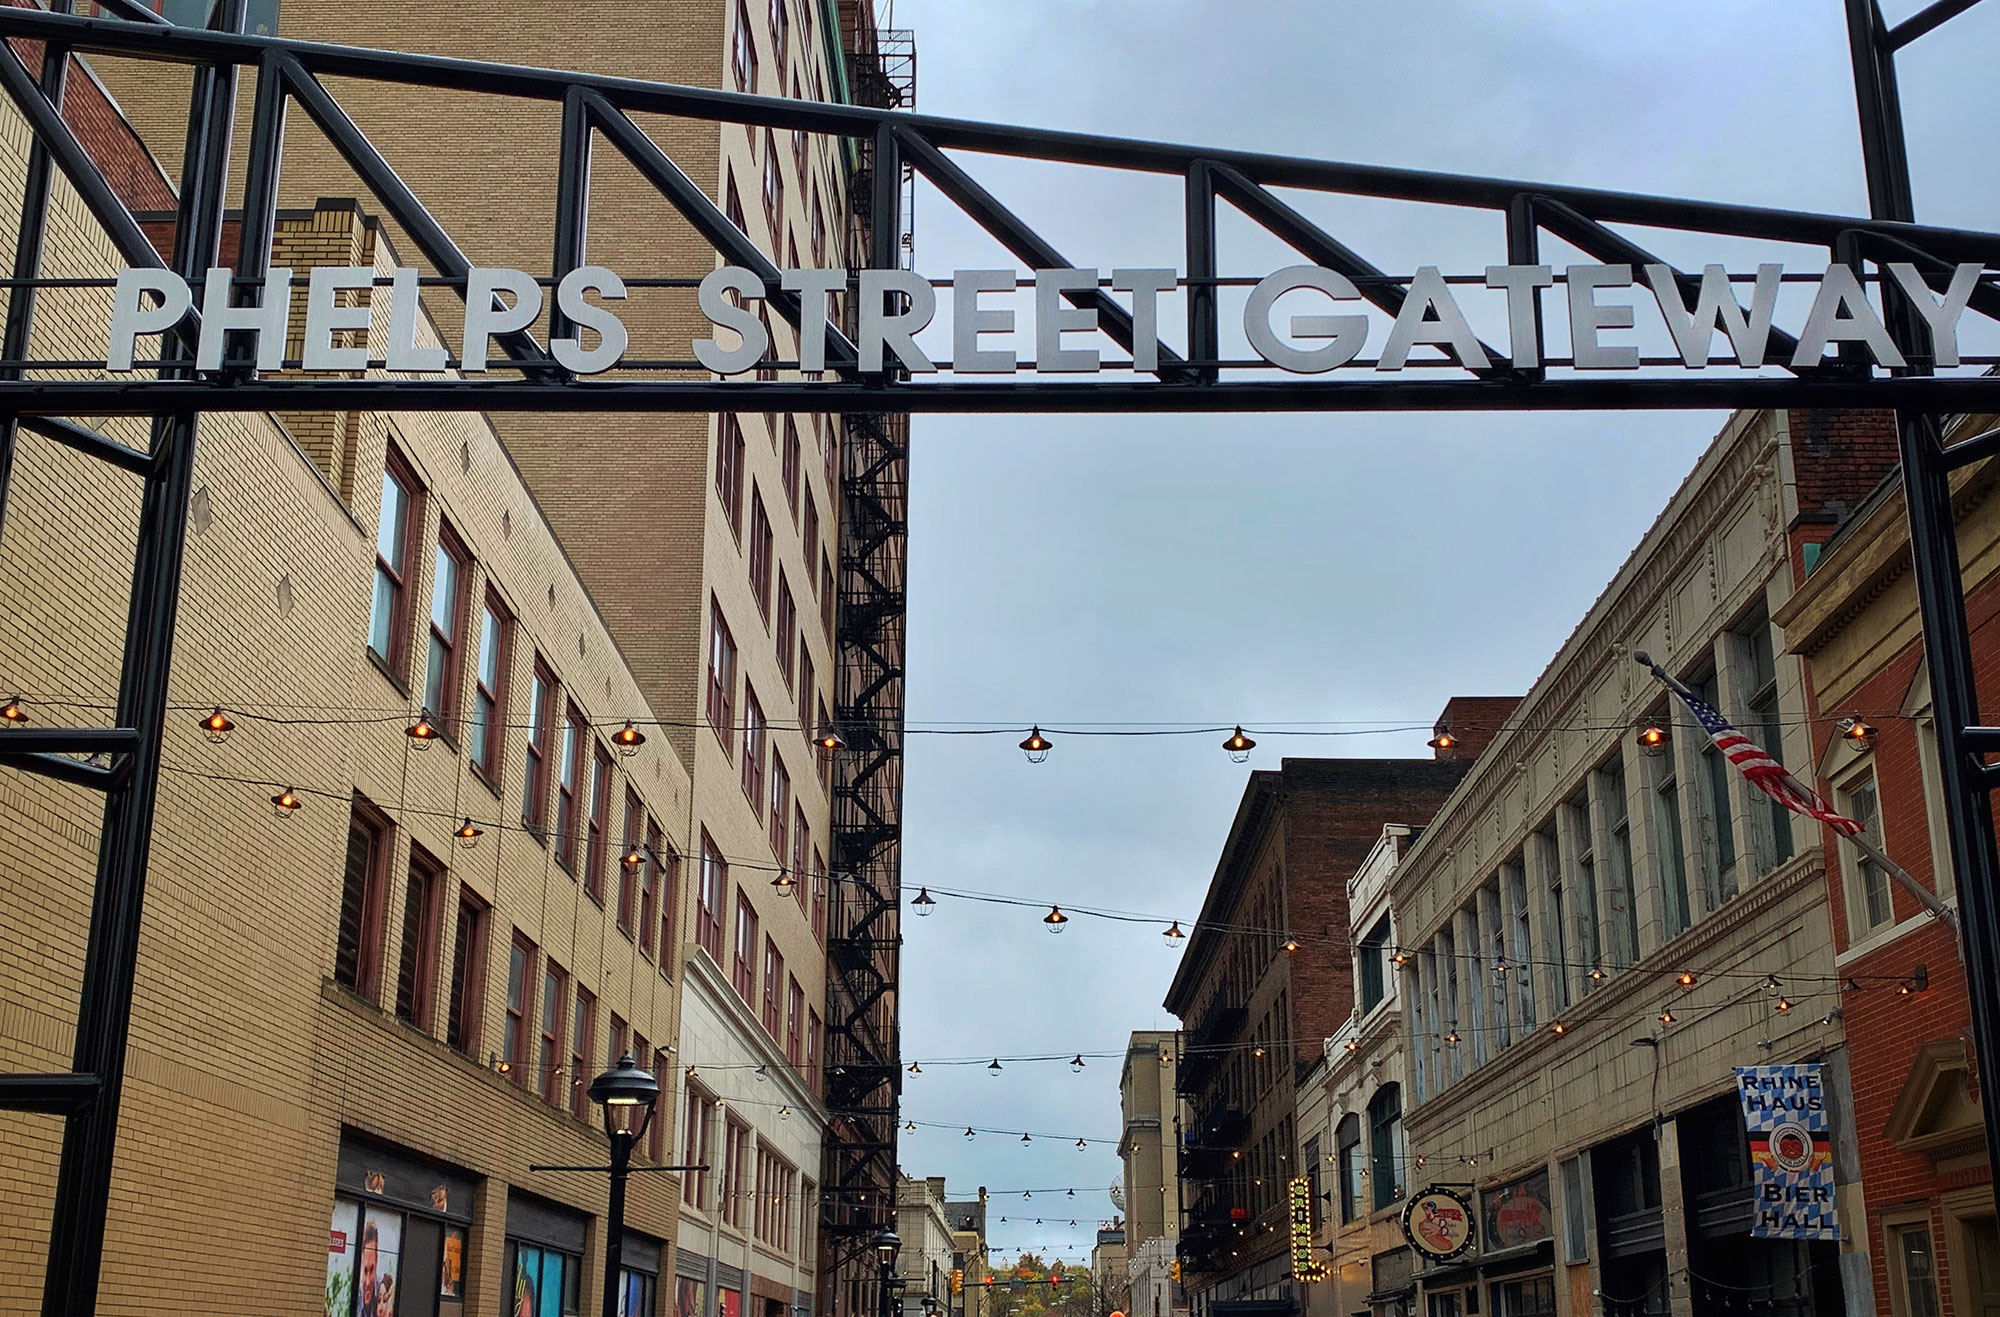 Phelps St. Gateway